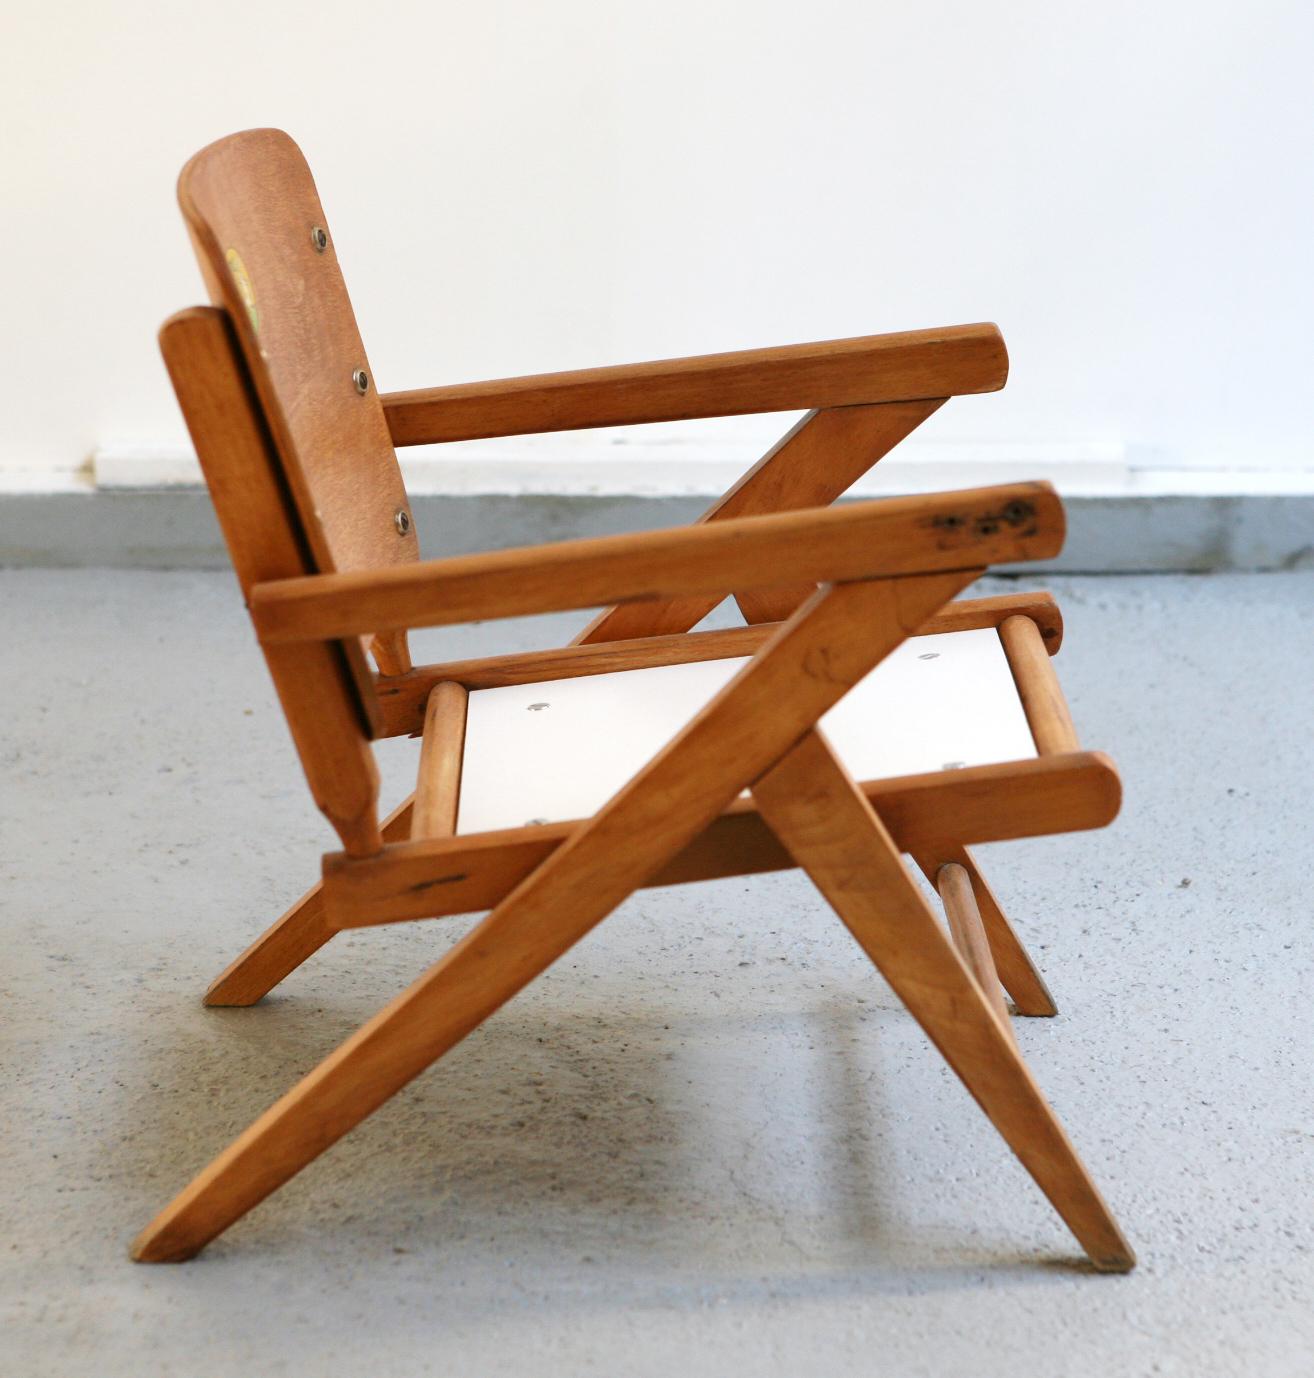 baos chaise enfant ann es 60 vintage restaur. Black Bedroom Furniture Sets. Home Design Ideas